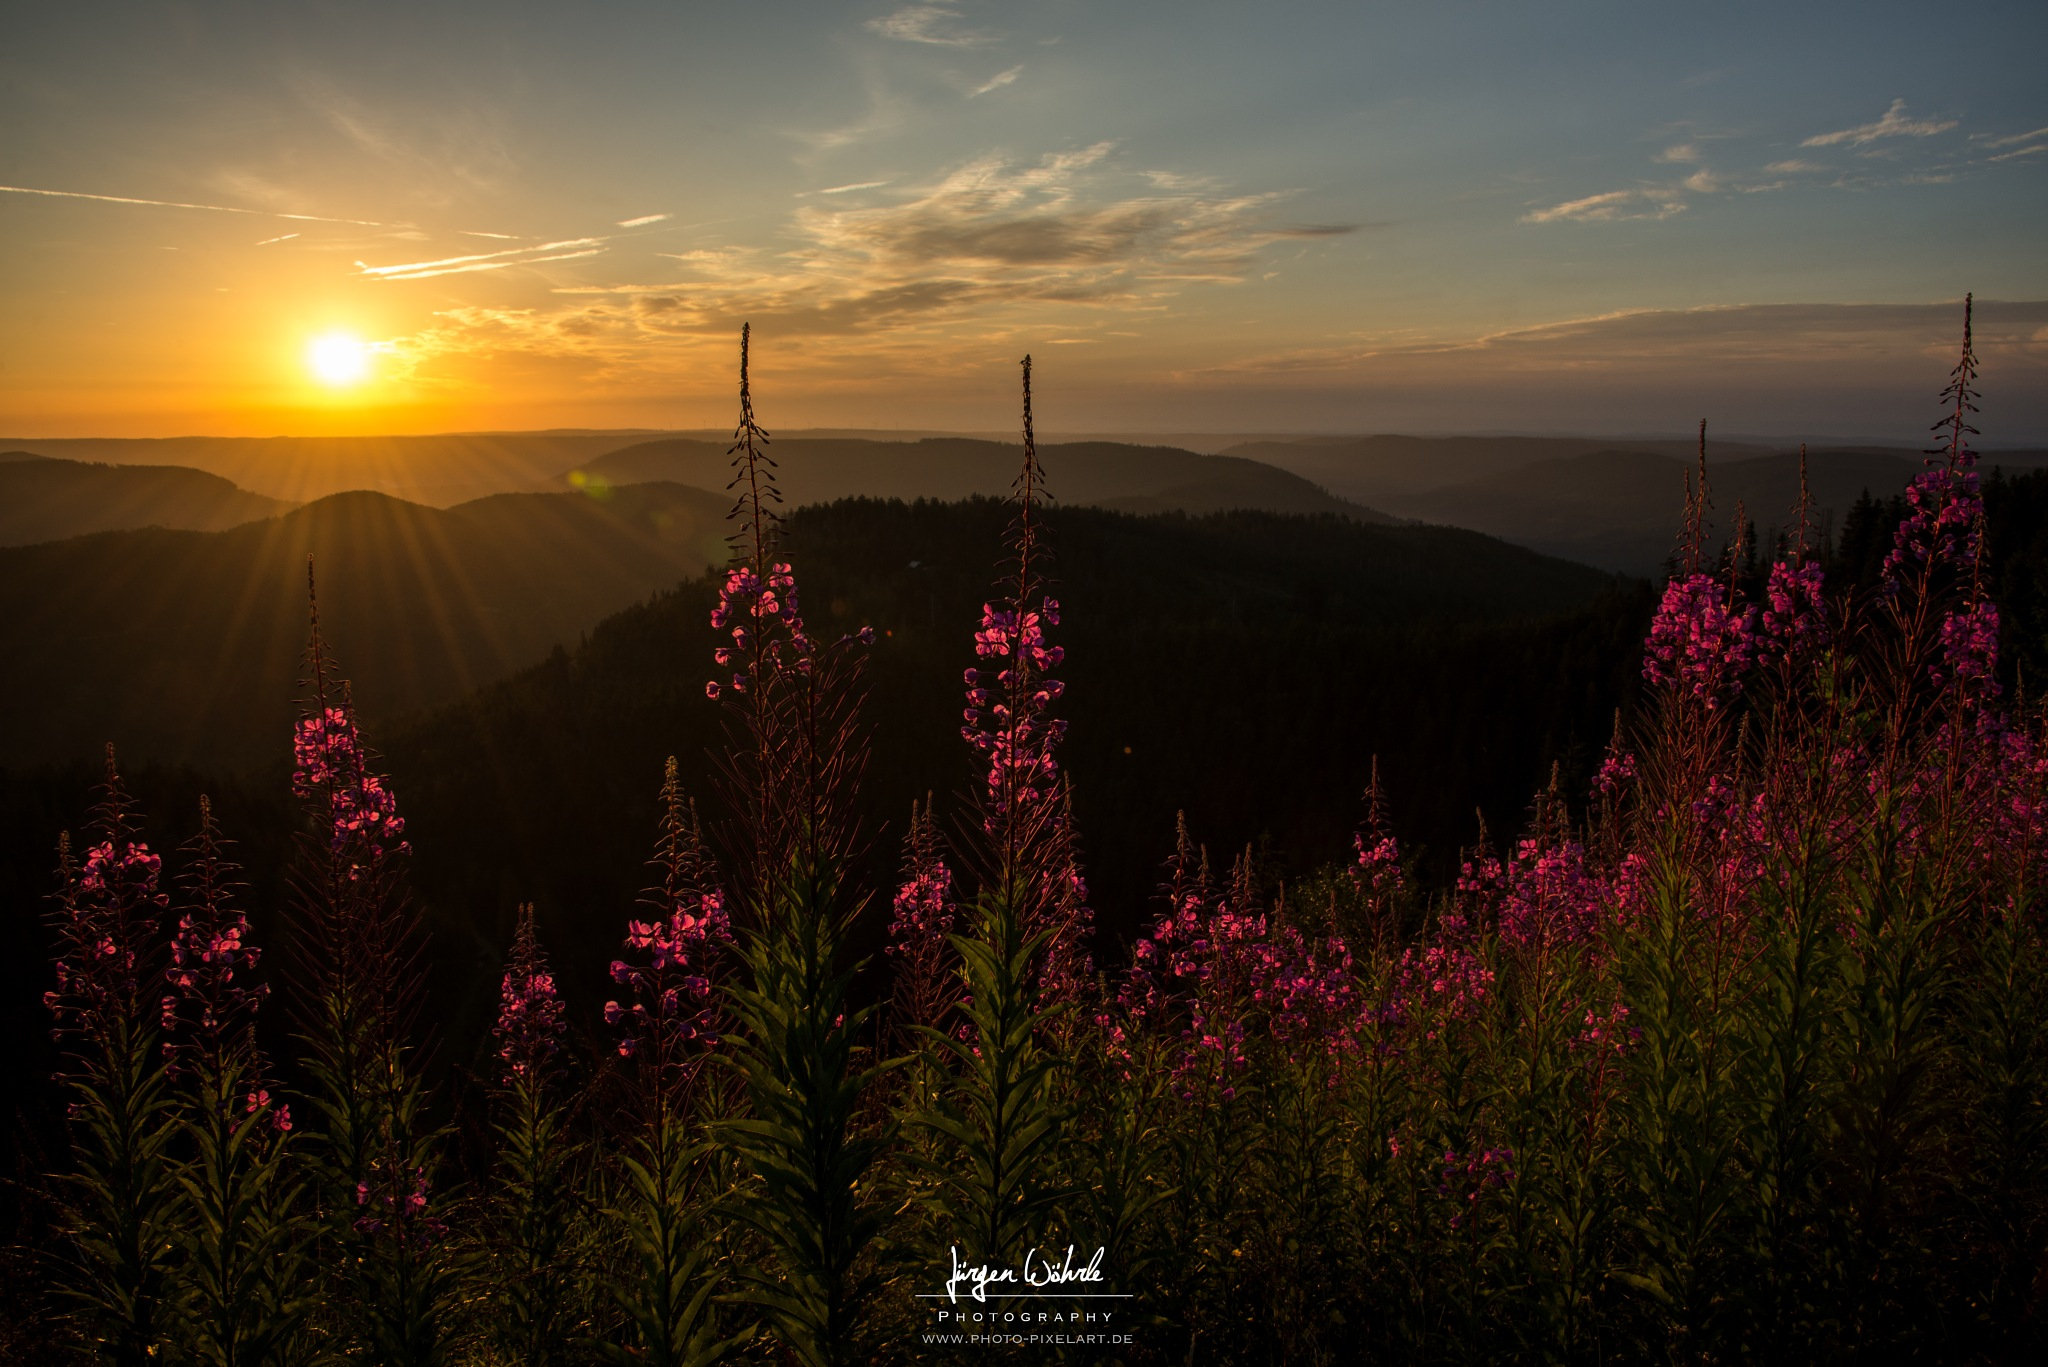 Sunrise by Jürgen Wöhrle by Photo-Pixelart